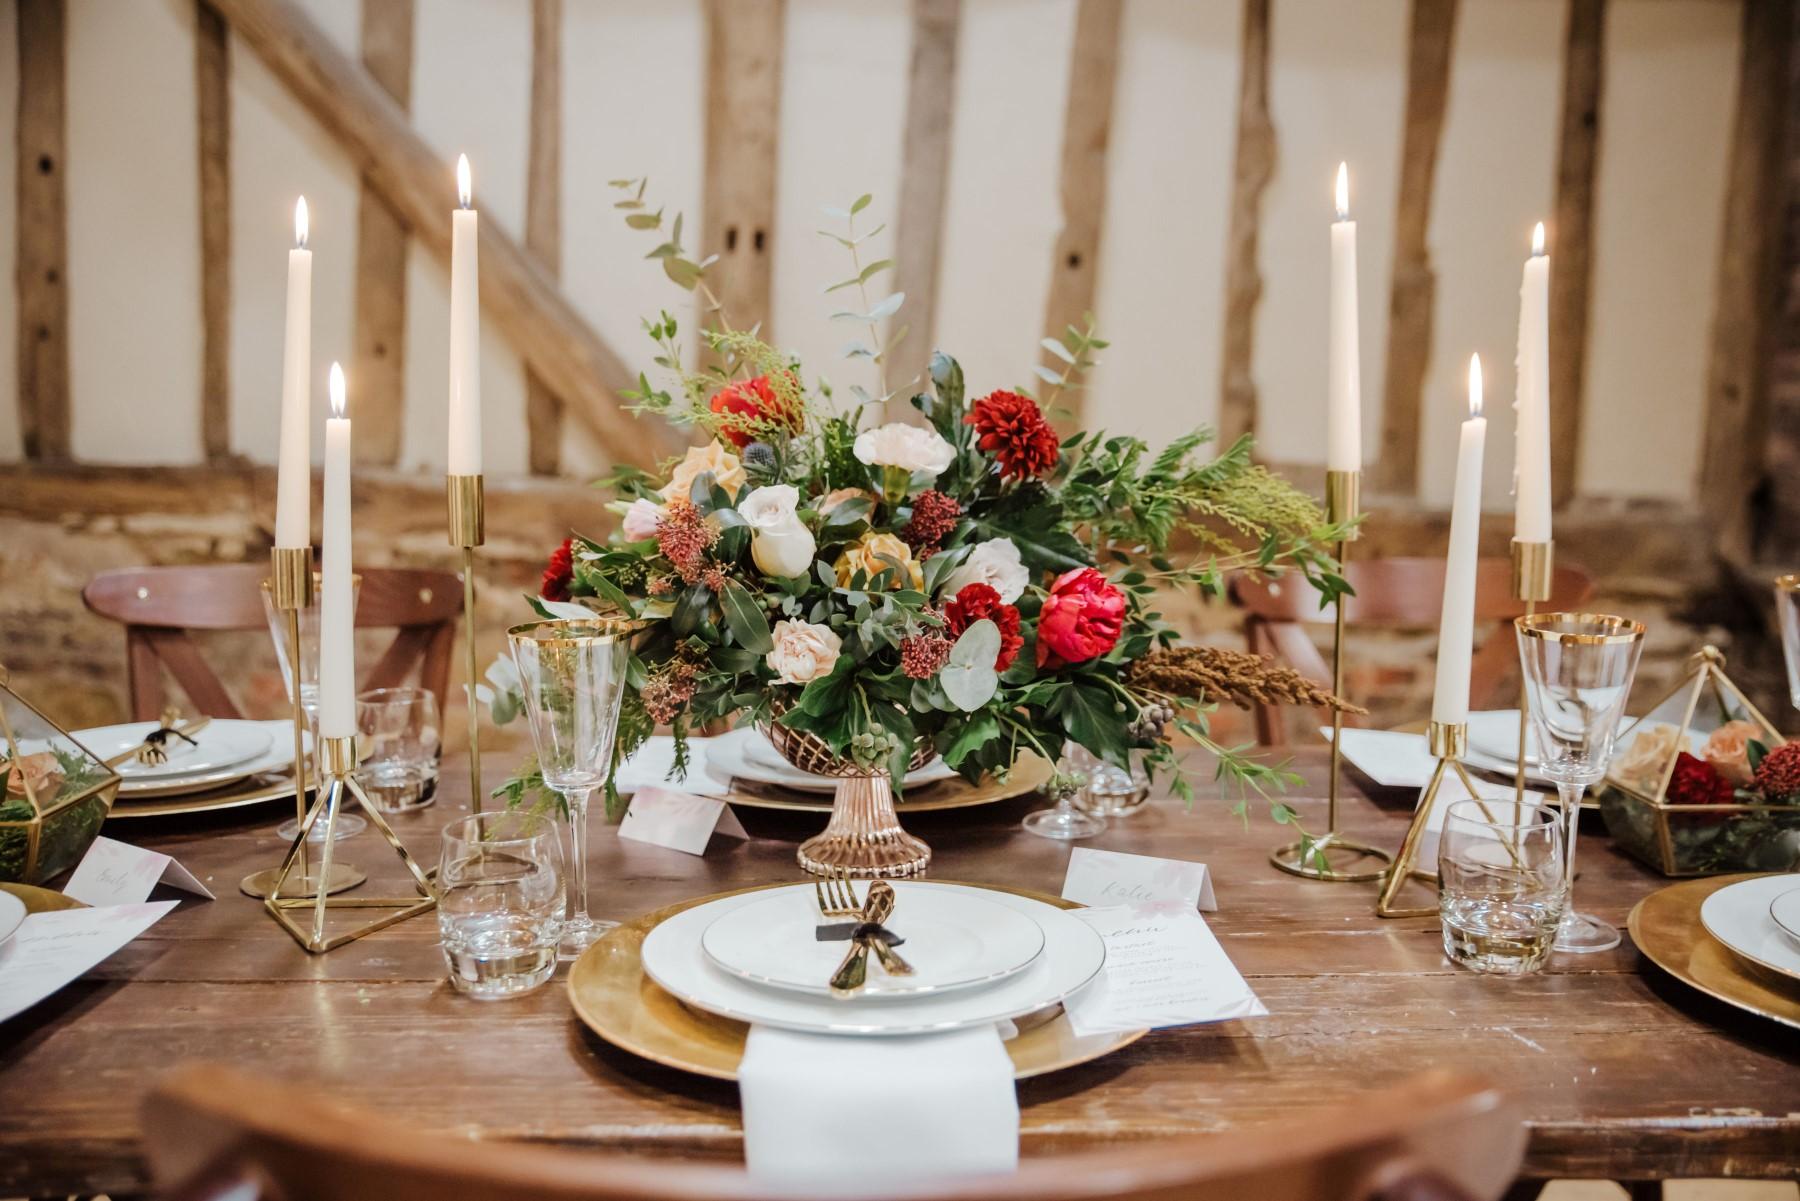 Roshni Photography- Barn Wedding Shoot- Flowers